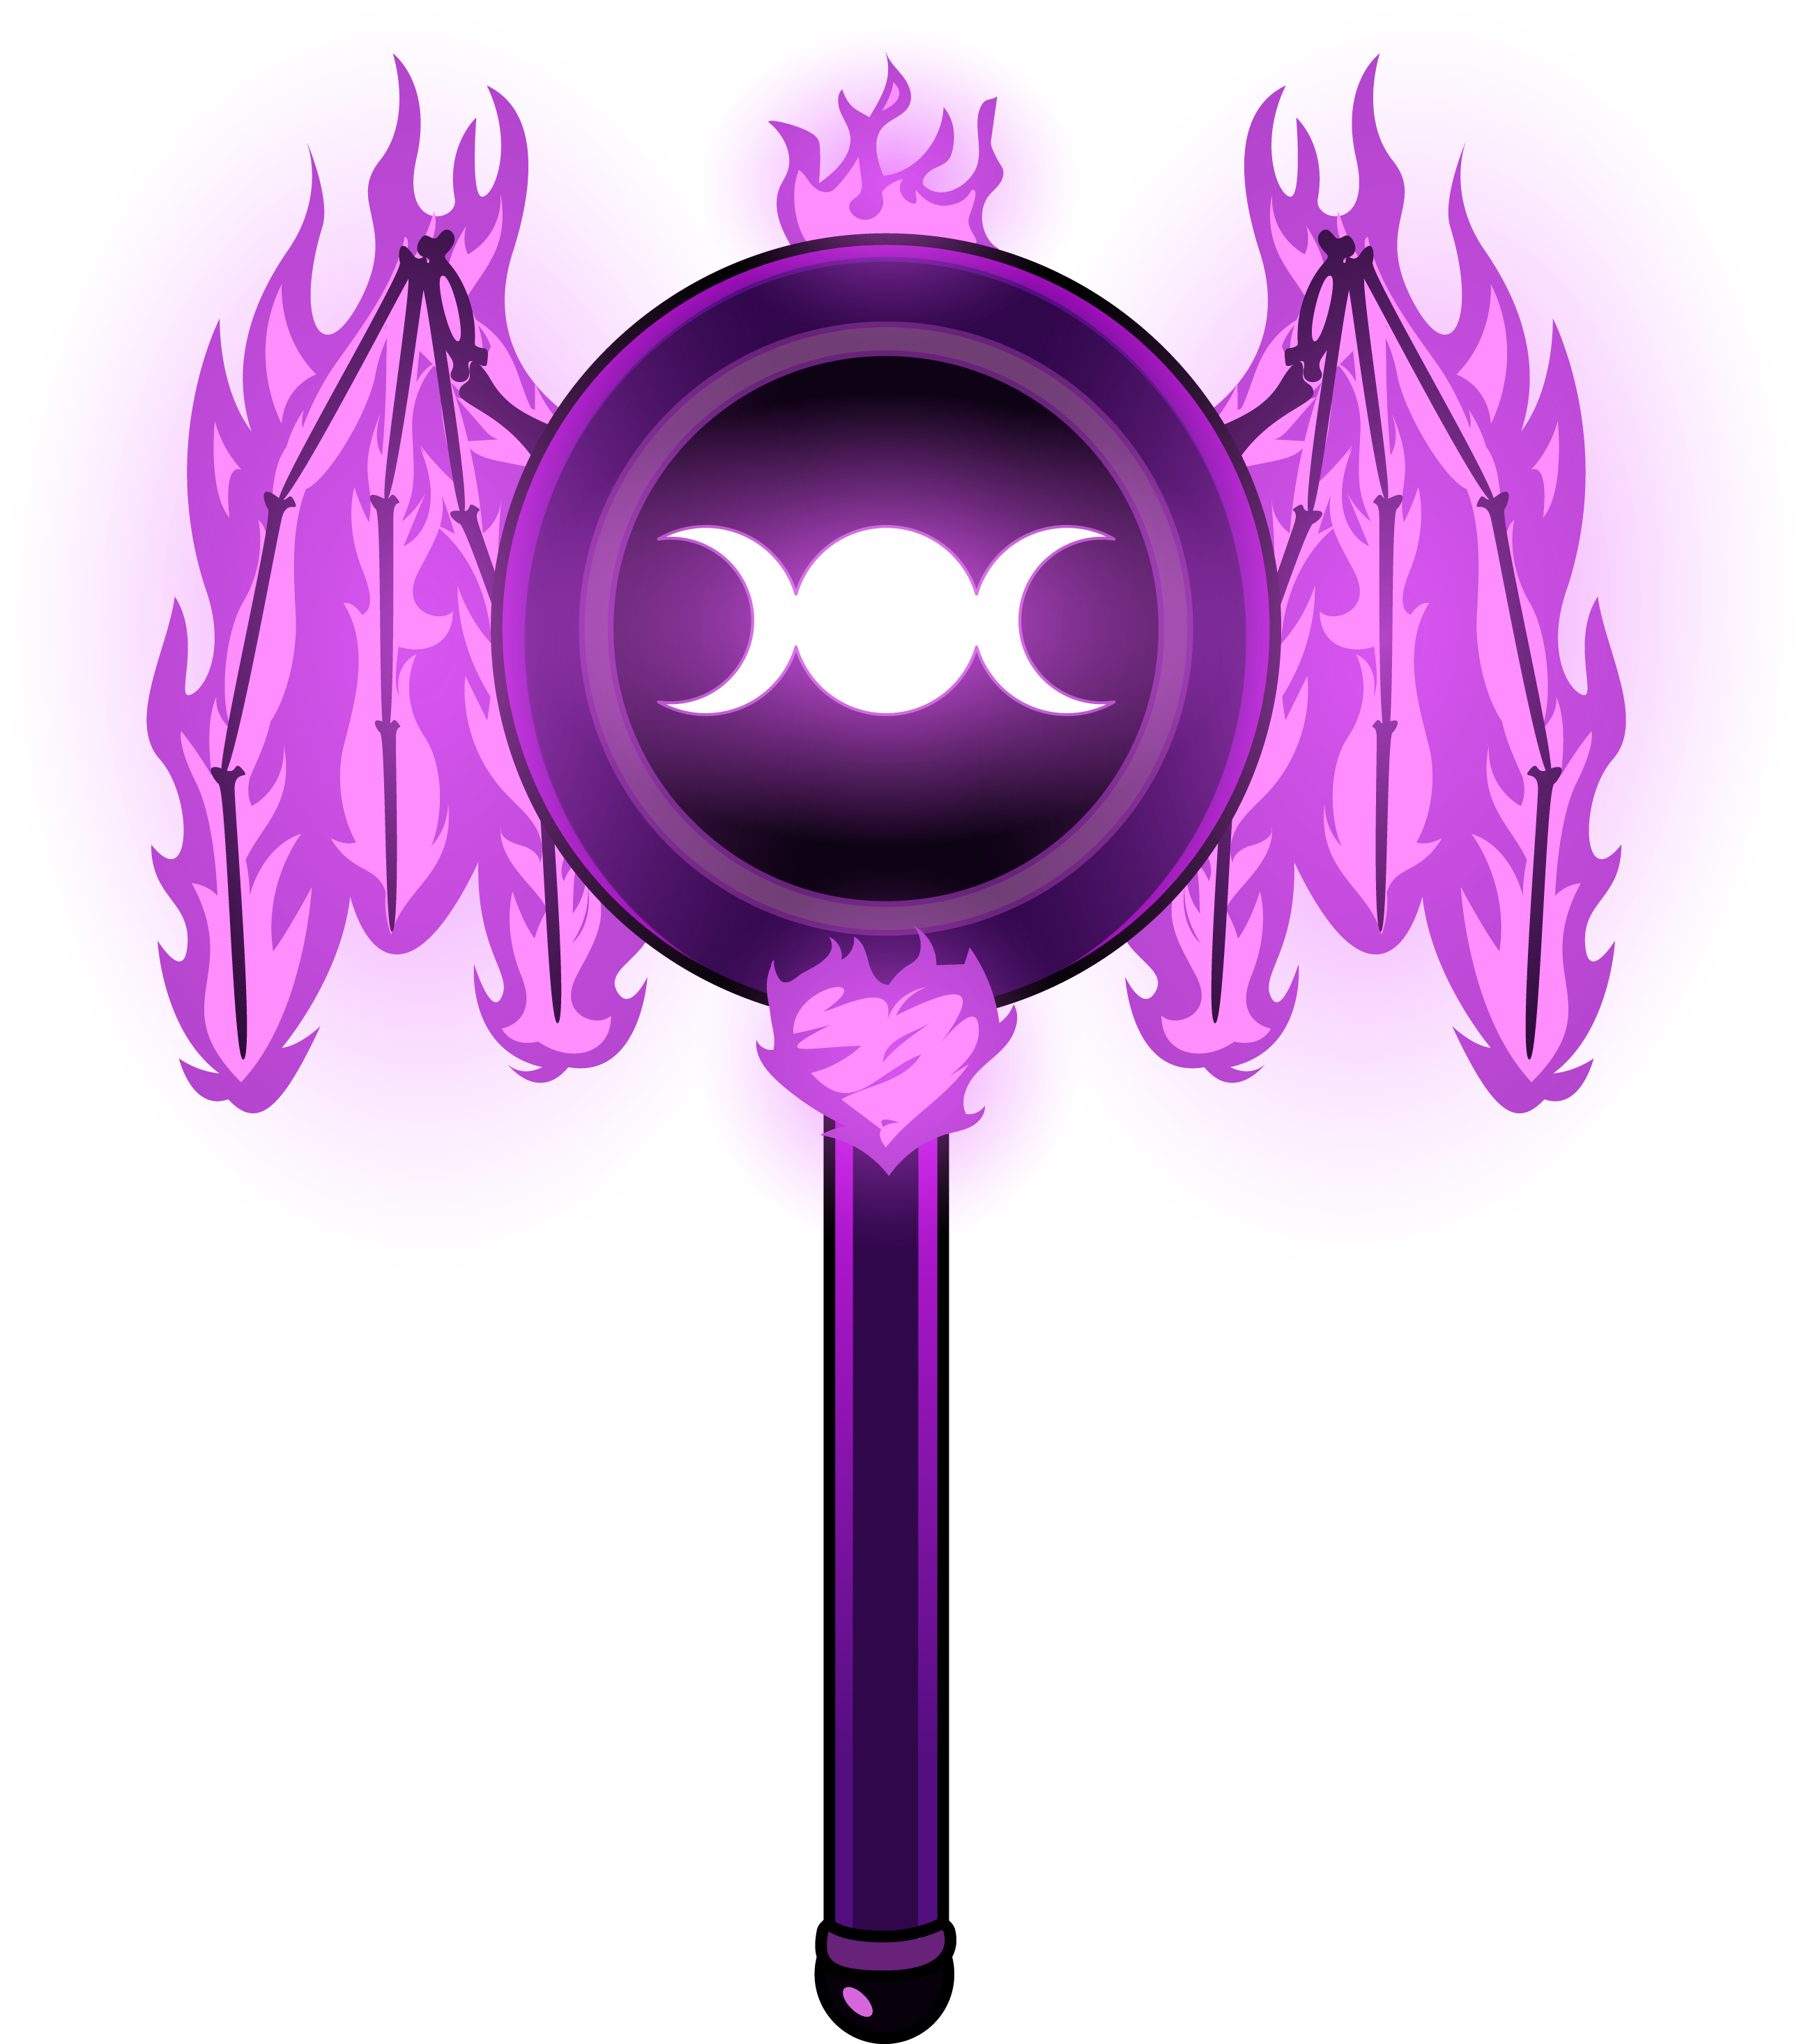 Aurora 39 s wand forbidden form concept by jgss0109 on for Farbideen wand